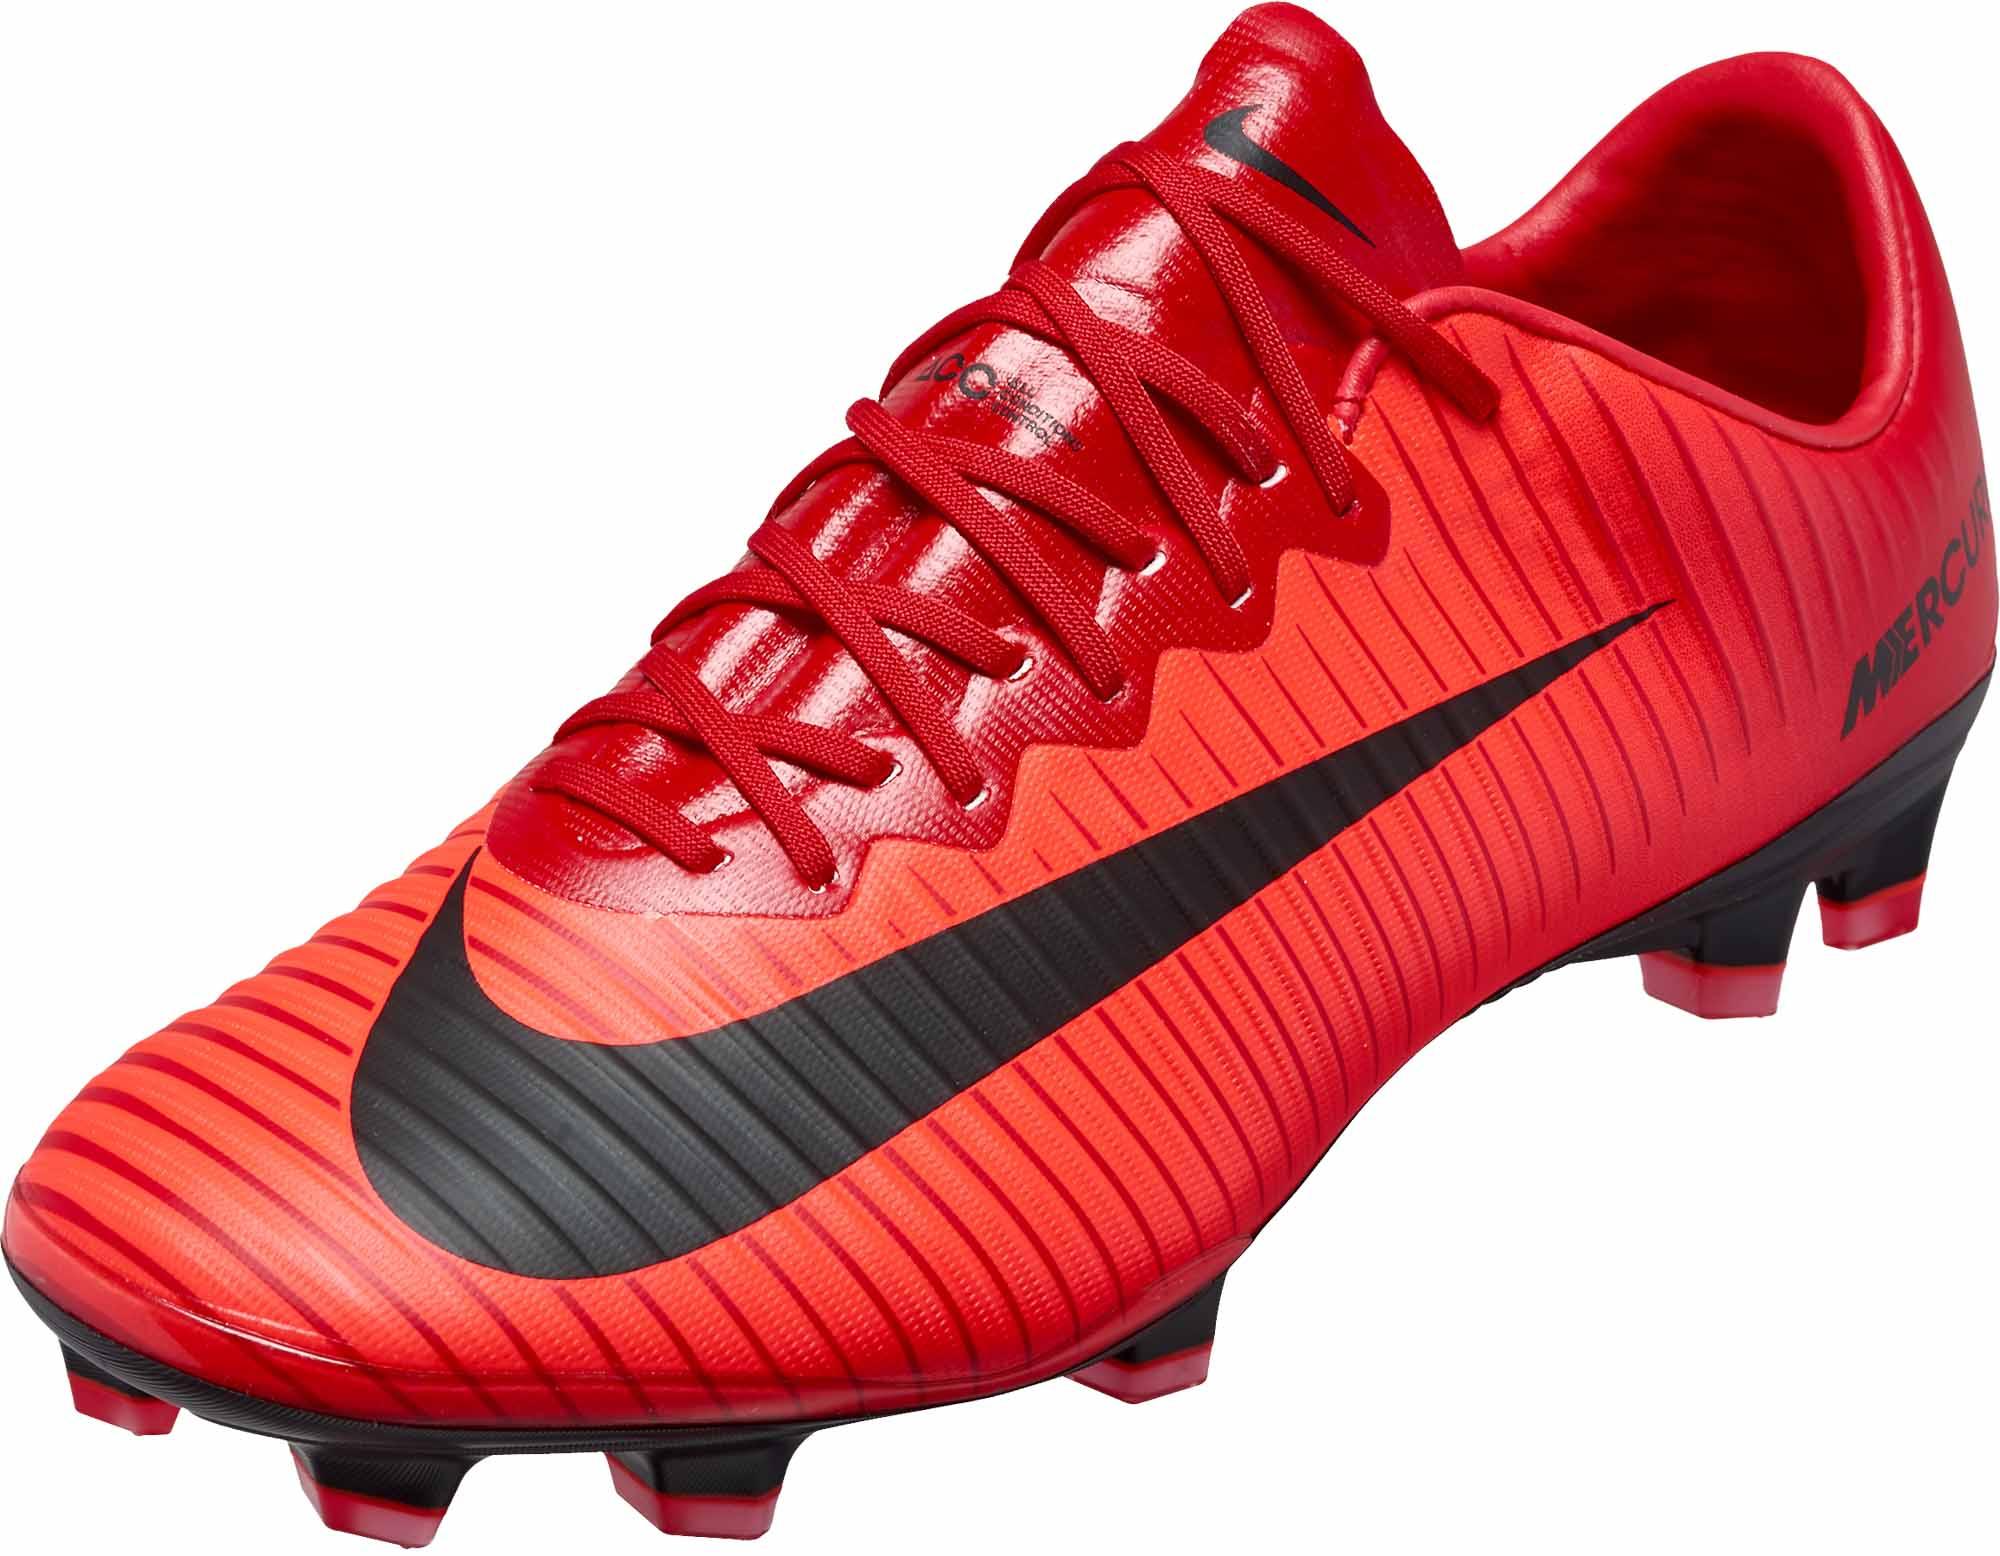 24915c1bfe5 Nike Mercurial Vapor XI FG - University Red   Black - Soccer Master